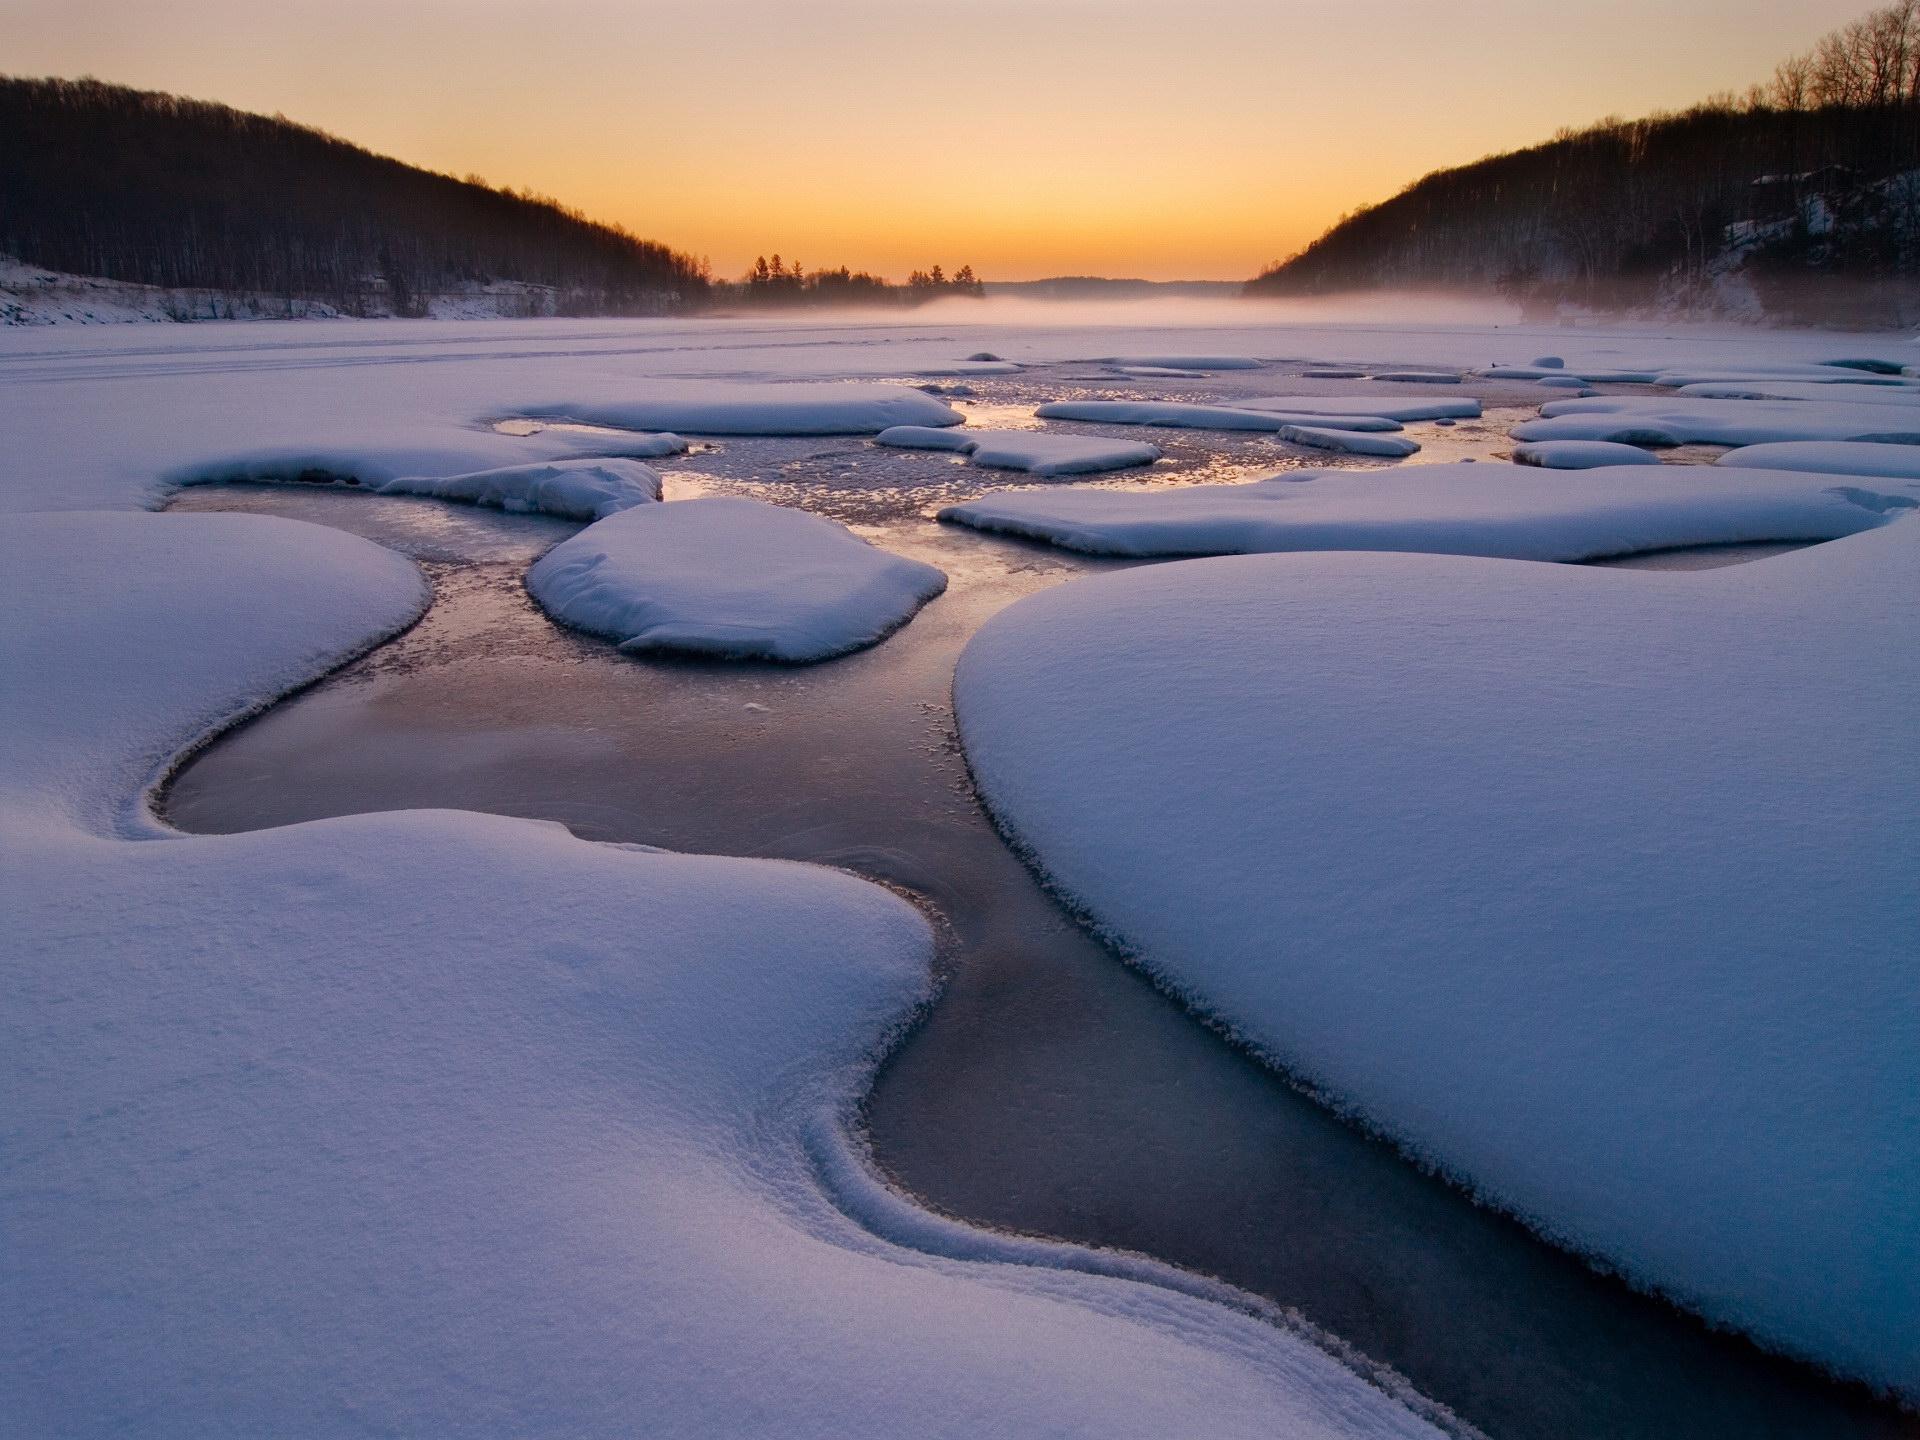 118118 скачать обои Природа, Снег, Река, Лед, Холод, Зима, Вода - заставки и картинки бесплатно